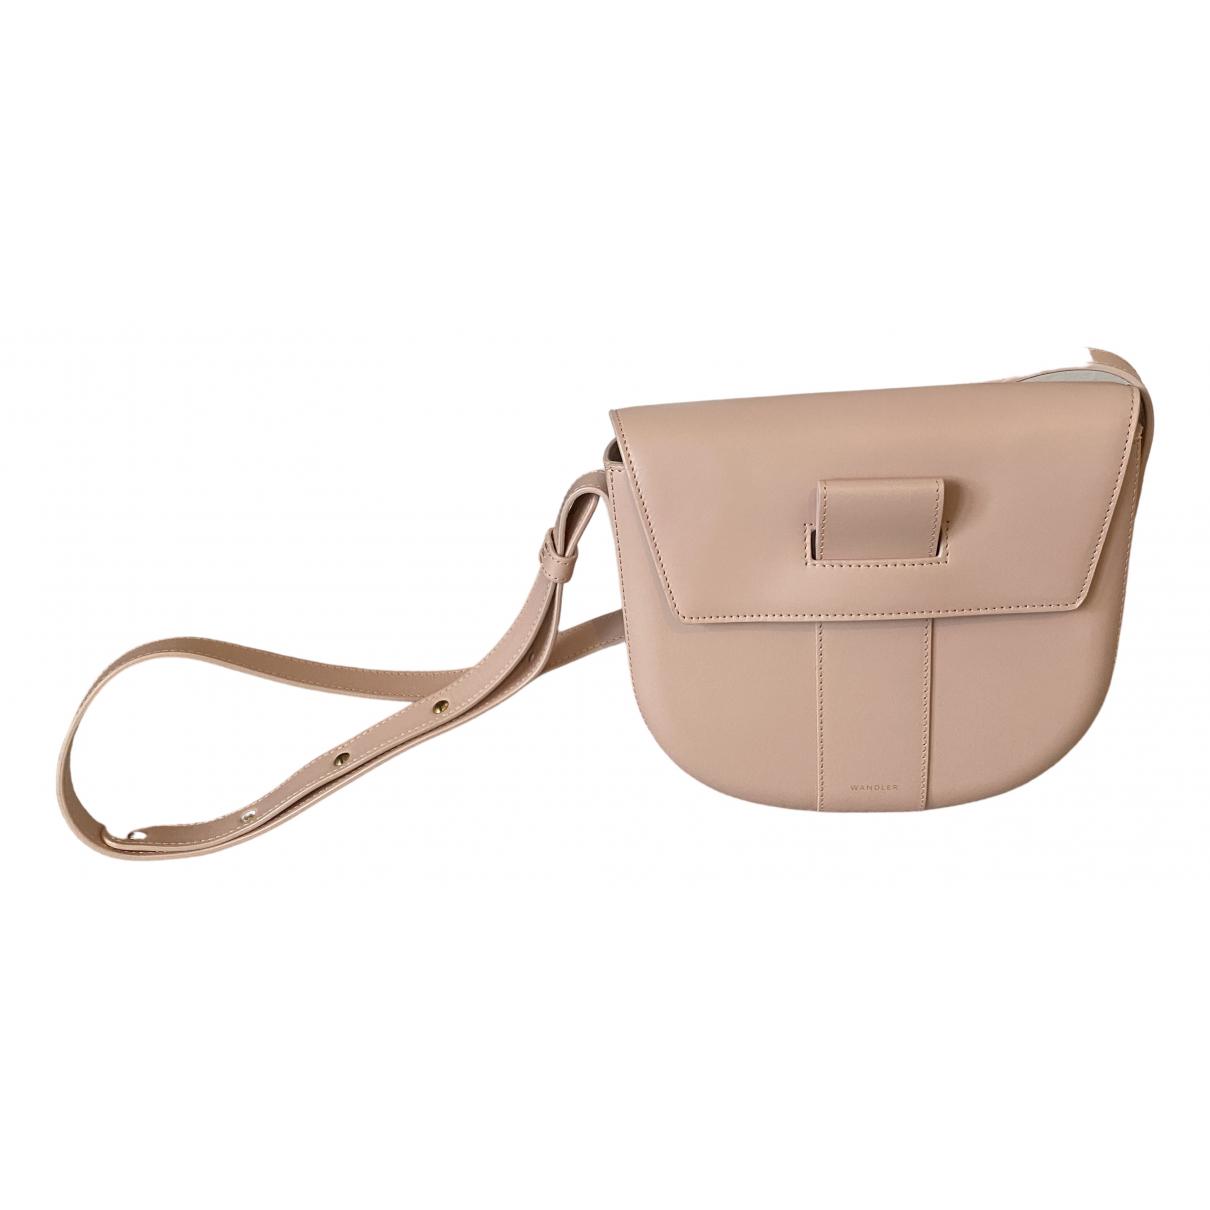 Wandler \N Pink Leather handbag for Women \N